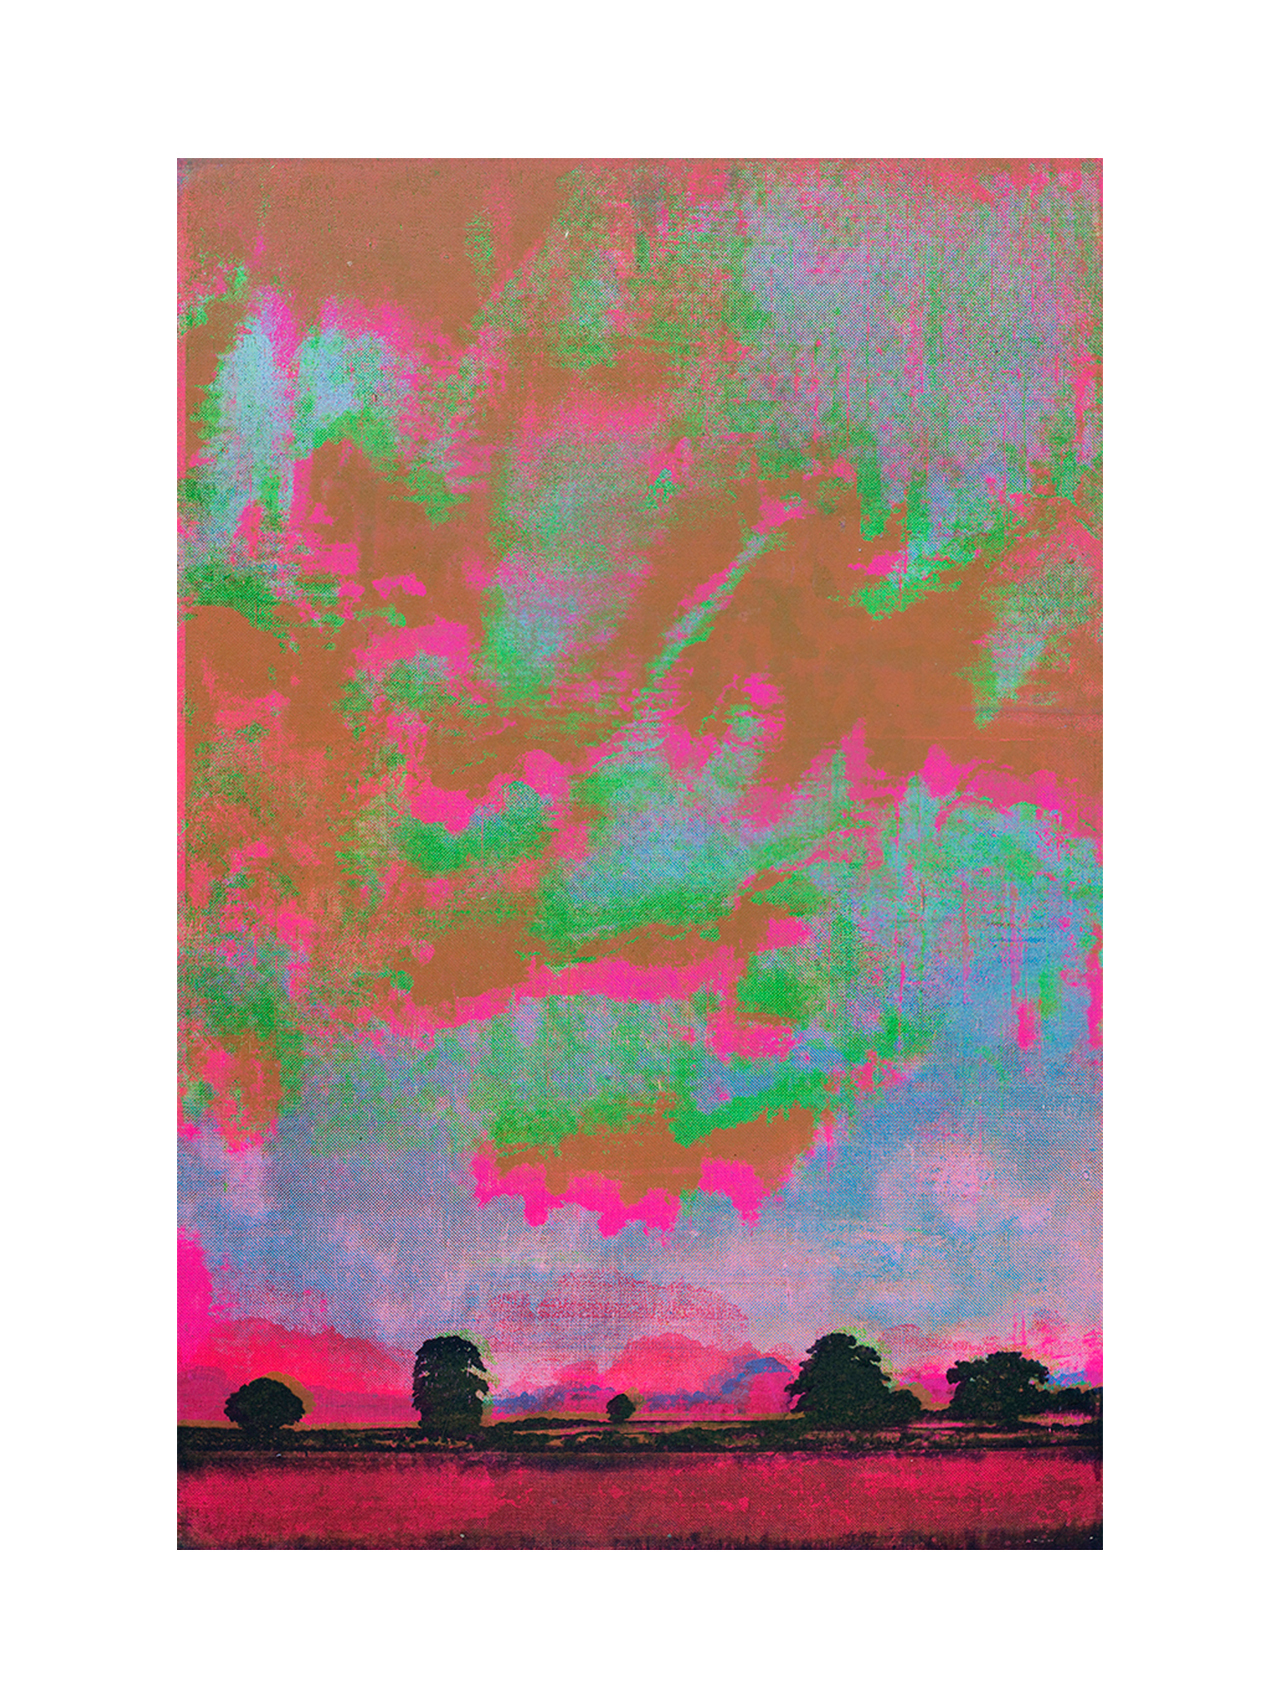 COLLIDER part 1 Screen Painting No.89 / Harry Adams